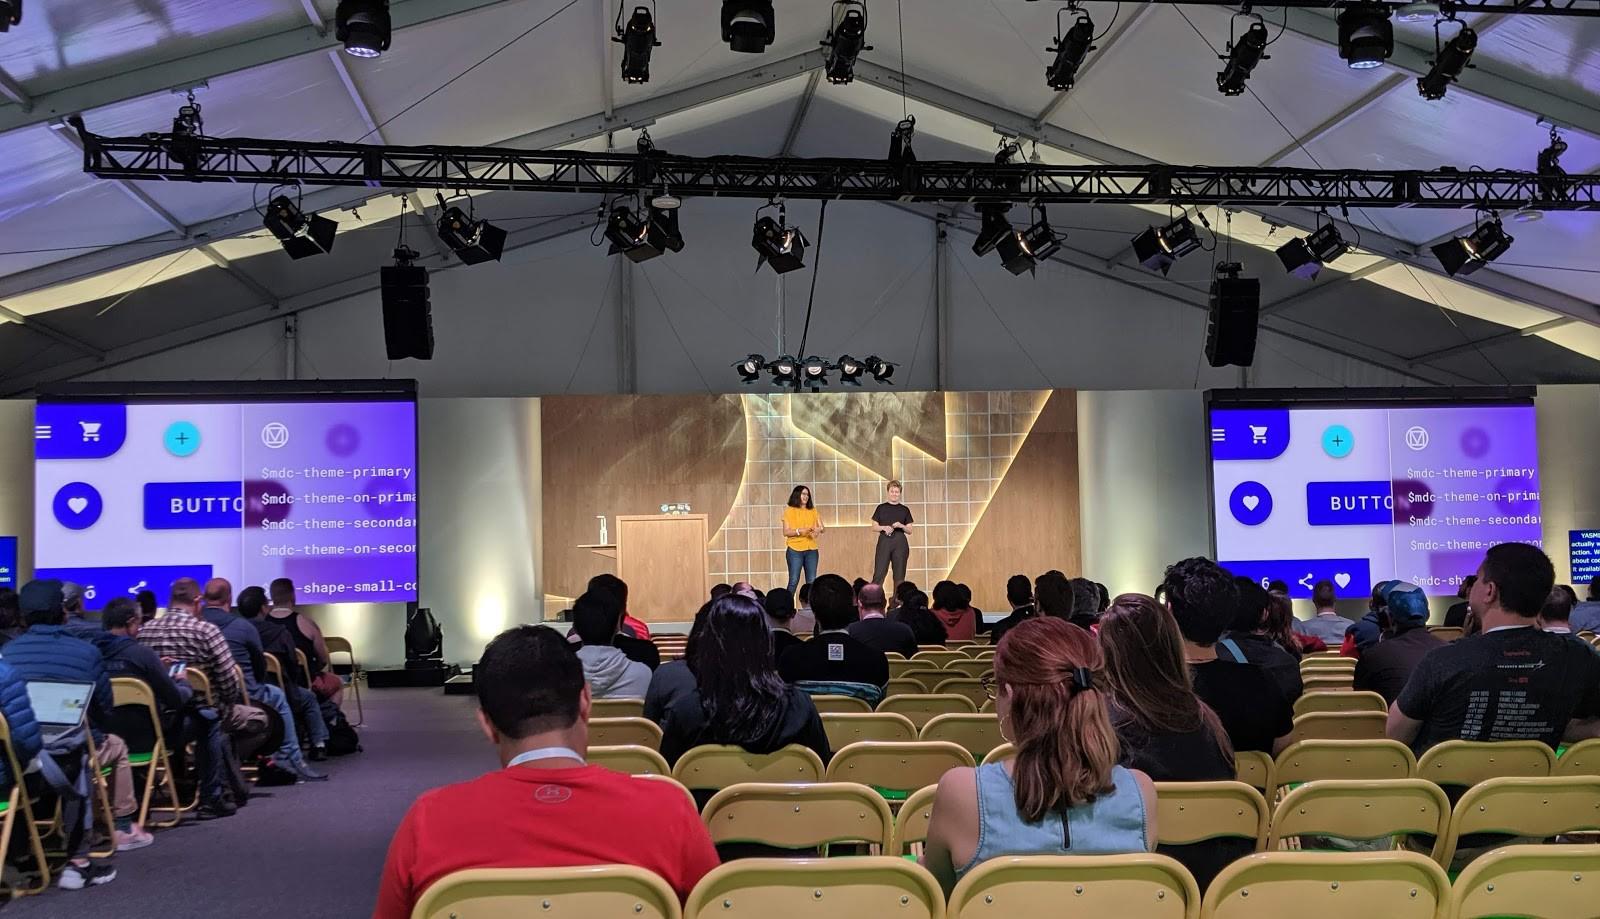 Yasmine Evjen and Michelle Alvarez on stage at Google I/O 2019